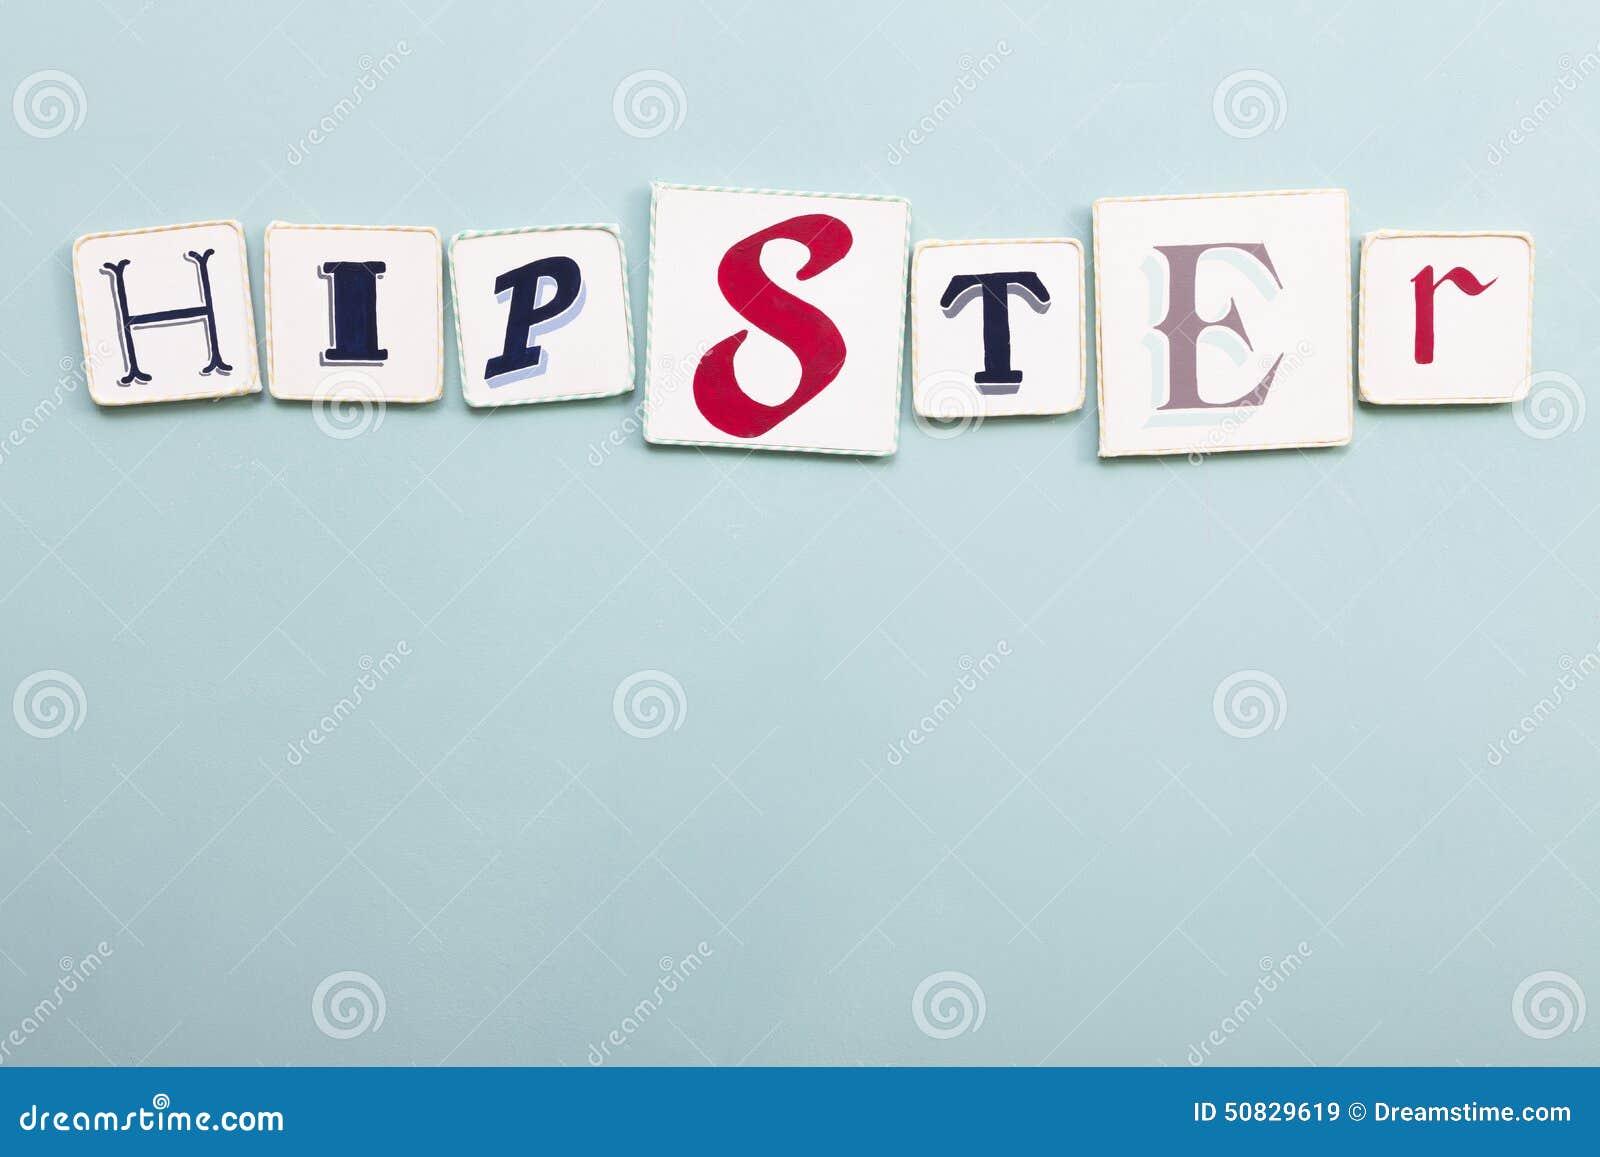 Hipster signboard. Handwritten colors letters word. Light blue backgr